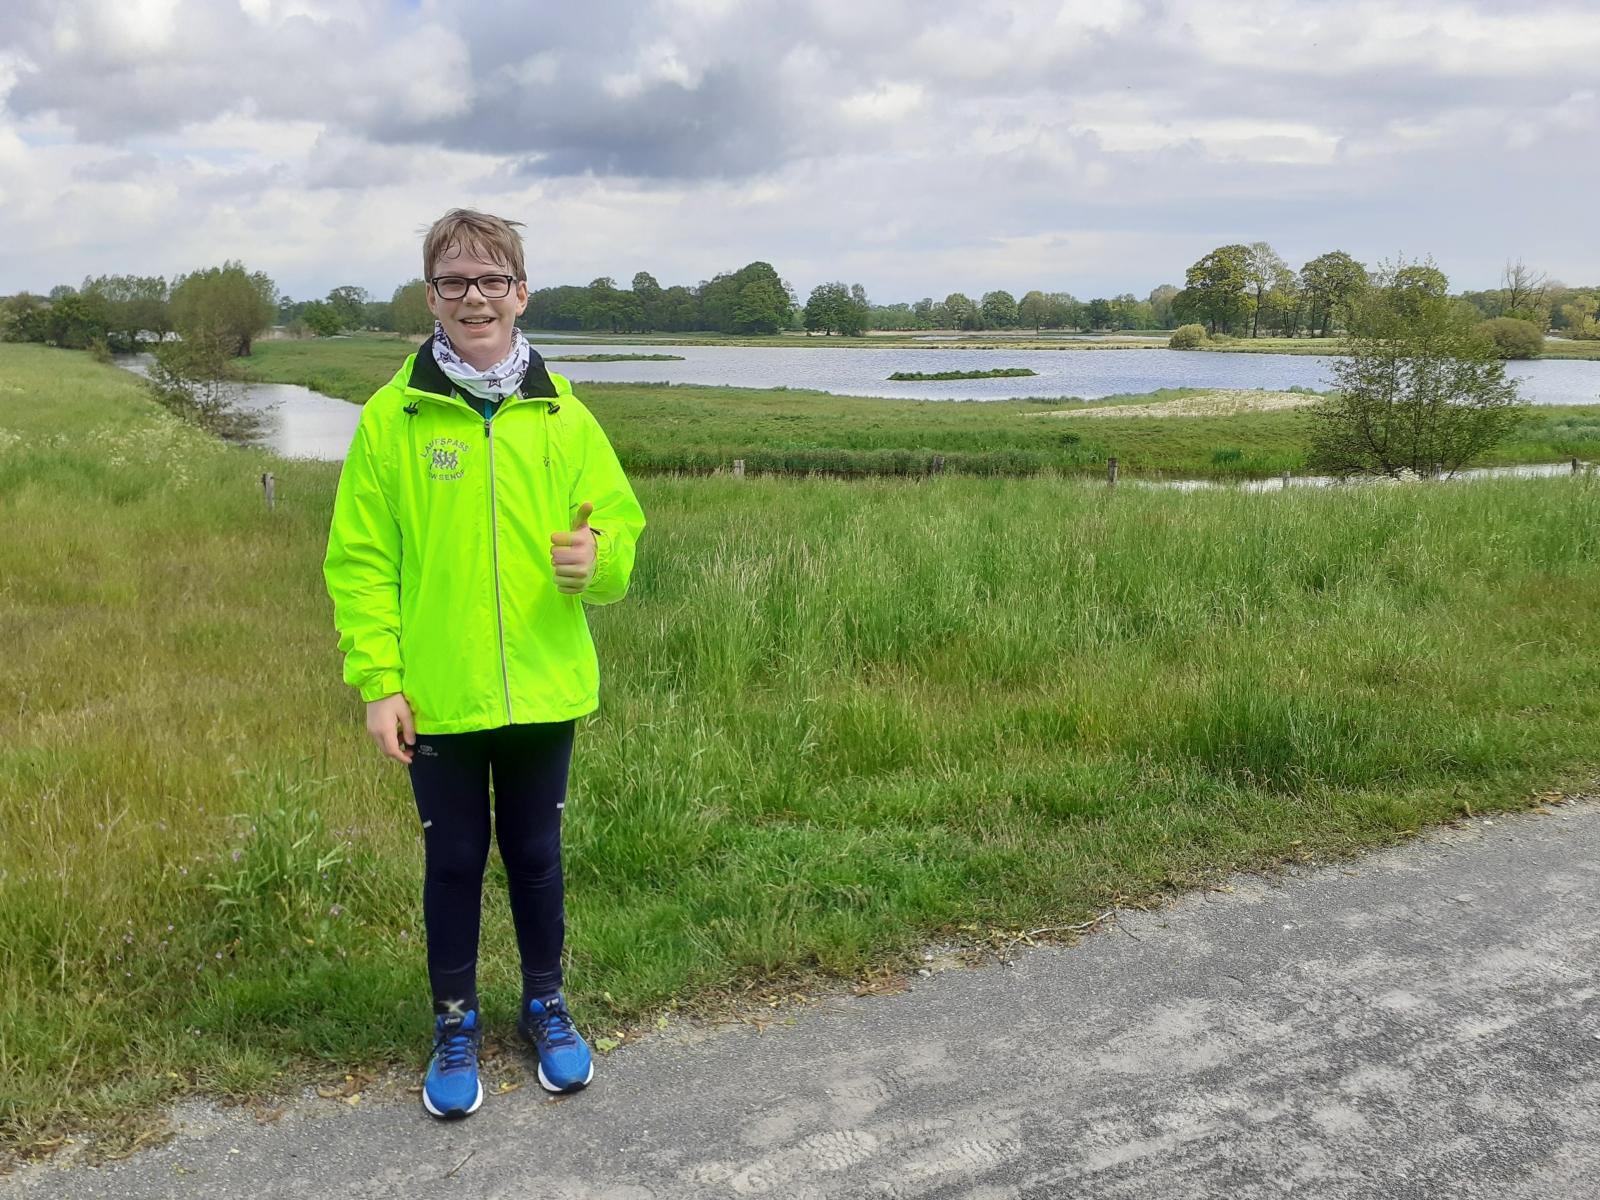 Brock-Jonas-19-Challenge-Steinhorster-Becken-7pU3g